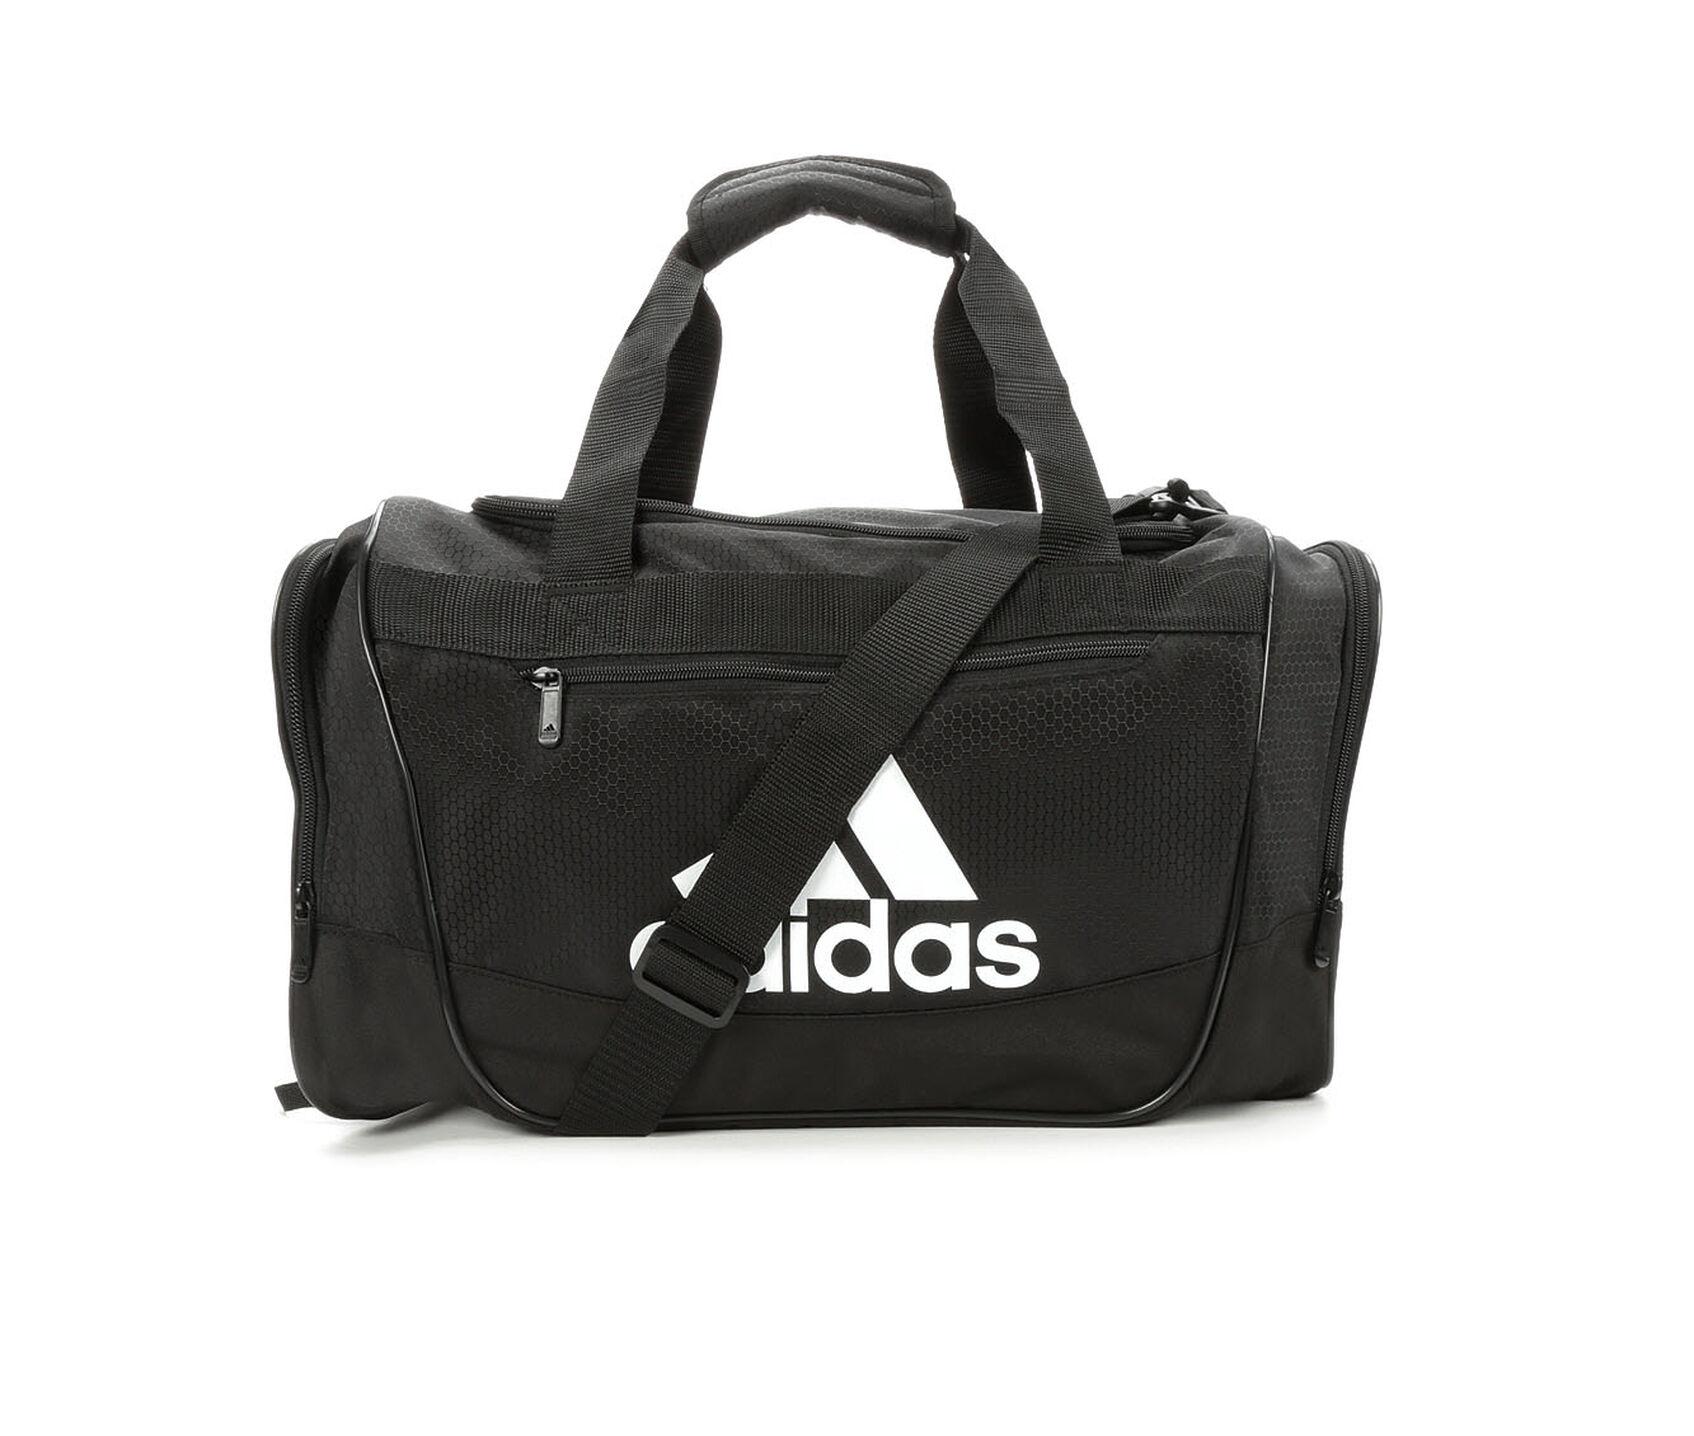 afafc6d9cee6f6 Adidas Defender III Small Duffel Bag | Shoe Carnival